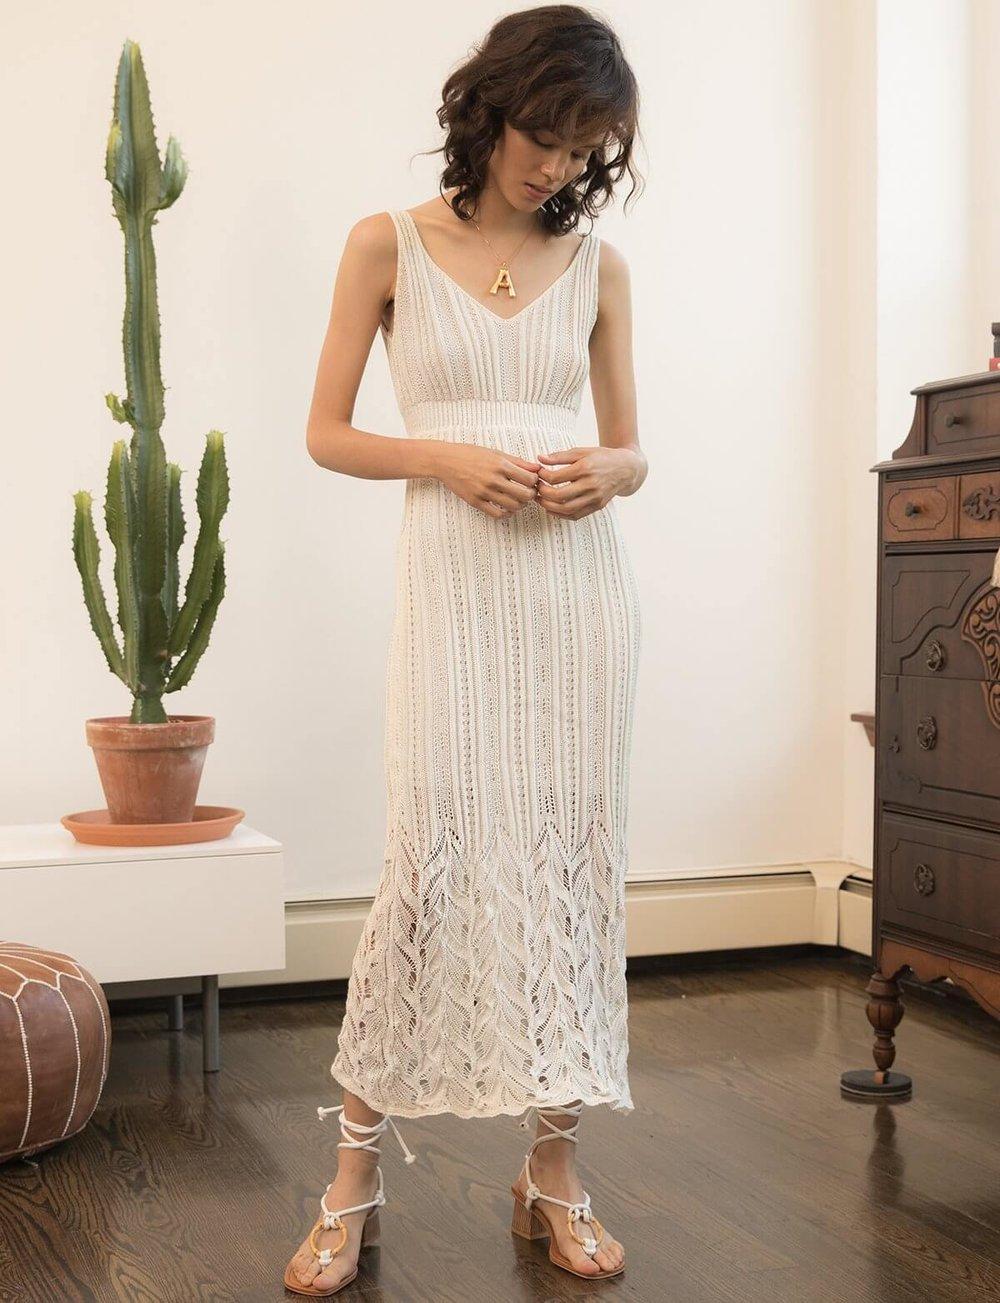 knit-crochet-dress_b19400dd-4d51-4de9-9e2b-84804c2d1fa1.jpg